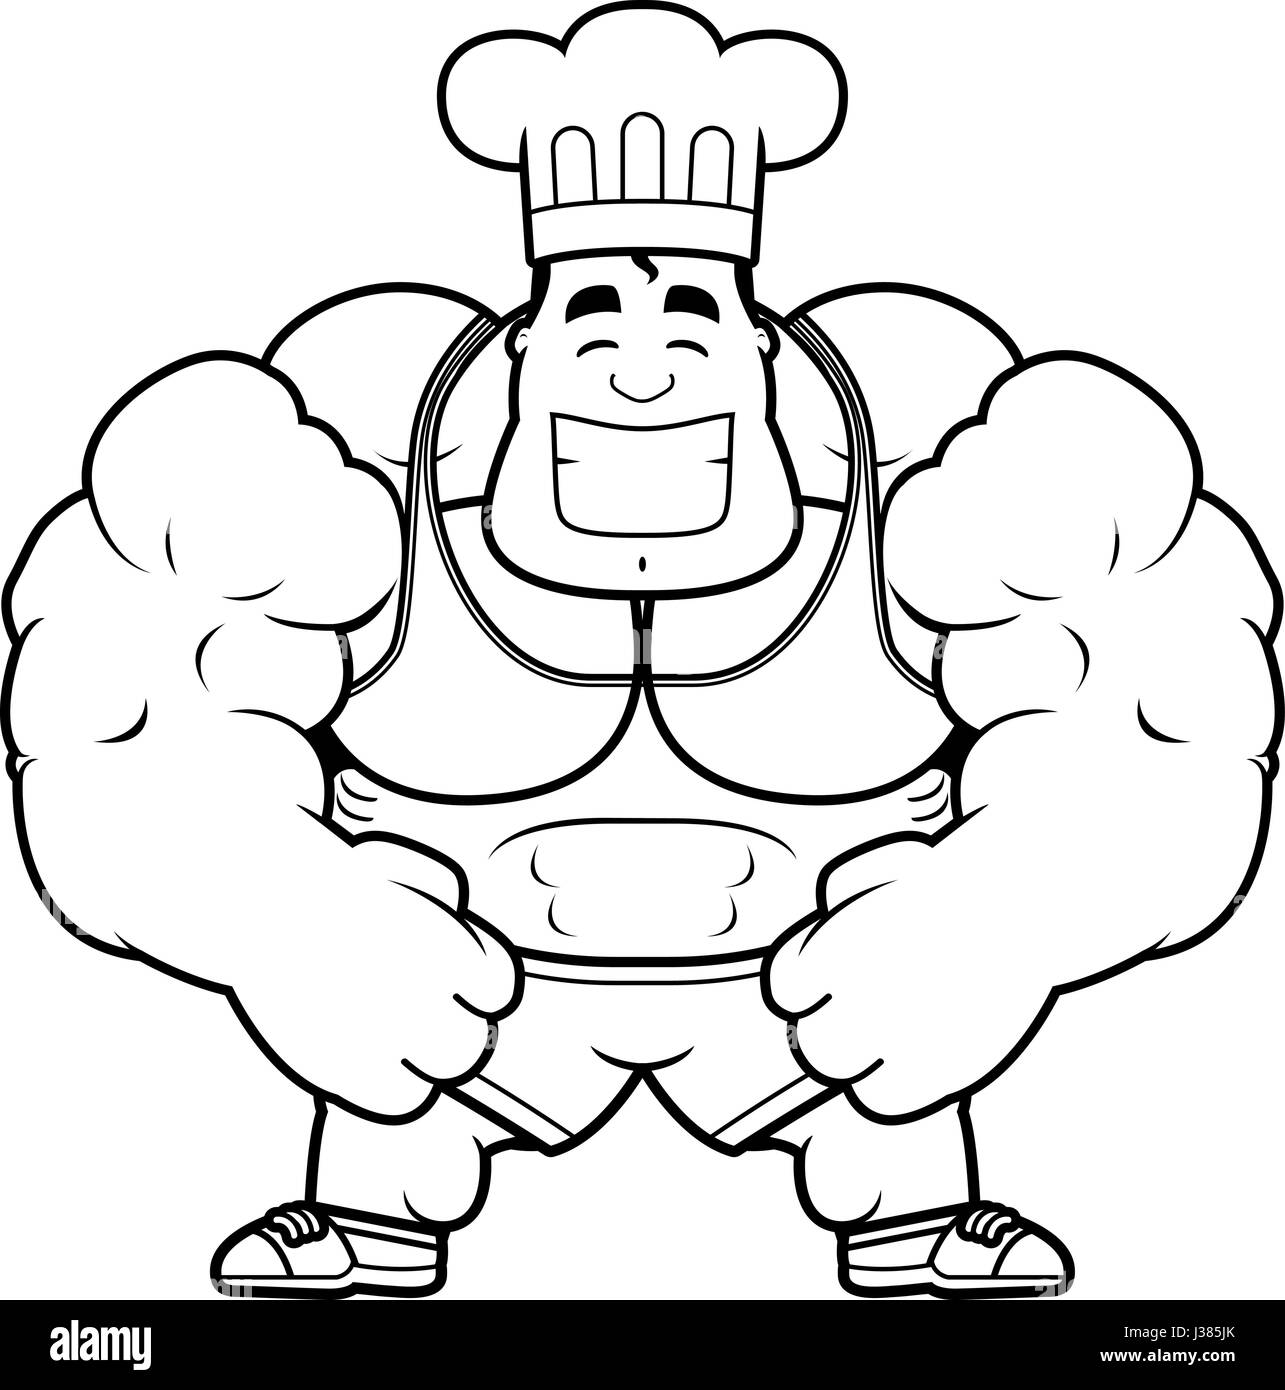 Bodybuilder Flexing Muscles Cartoon Stock Photos Bodybuilder